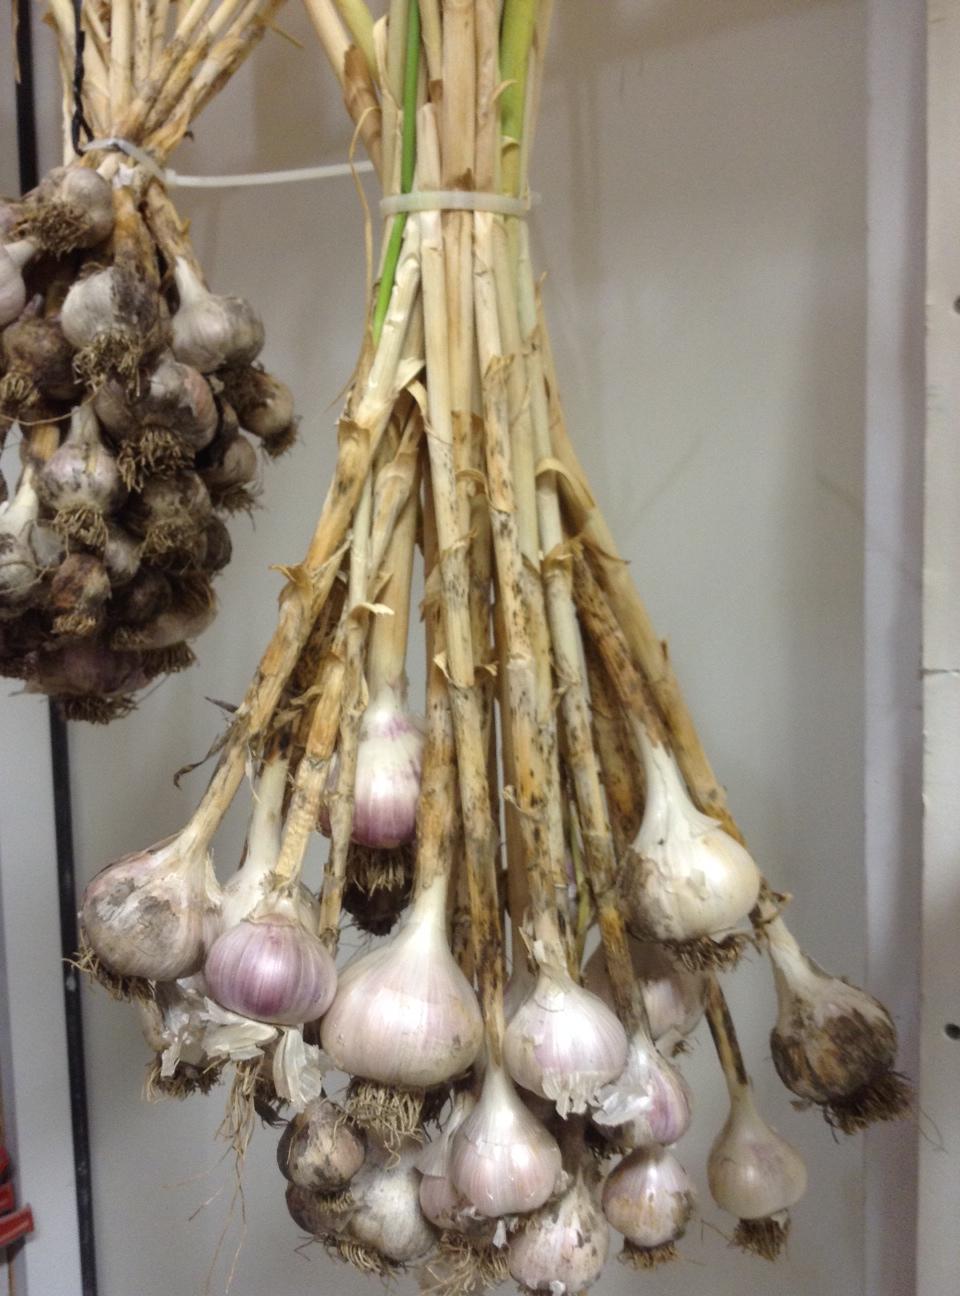 garlic-zap-strap